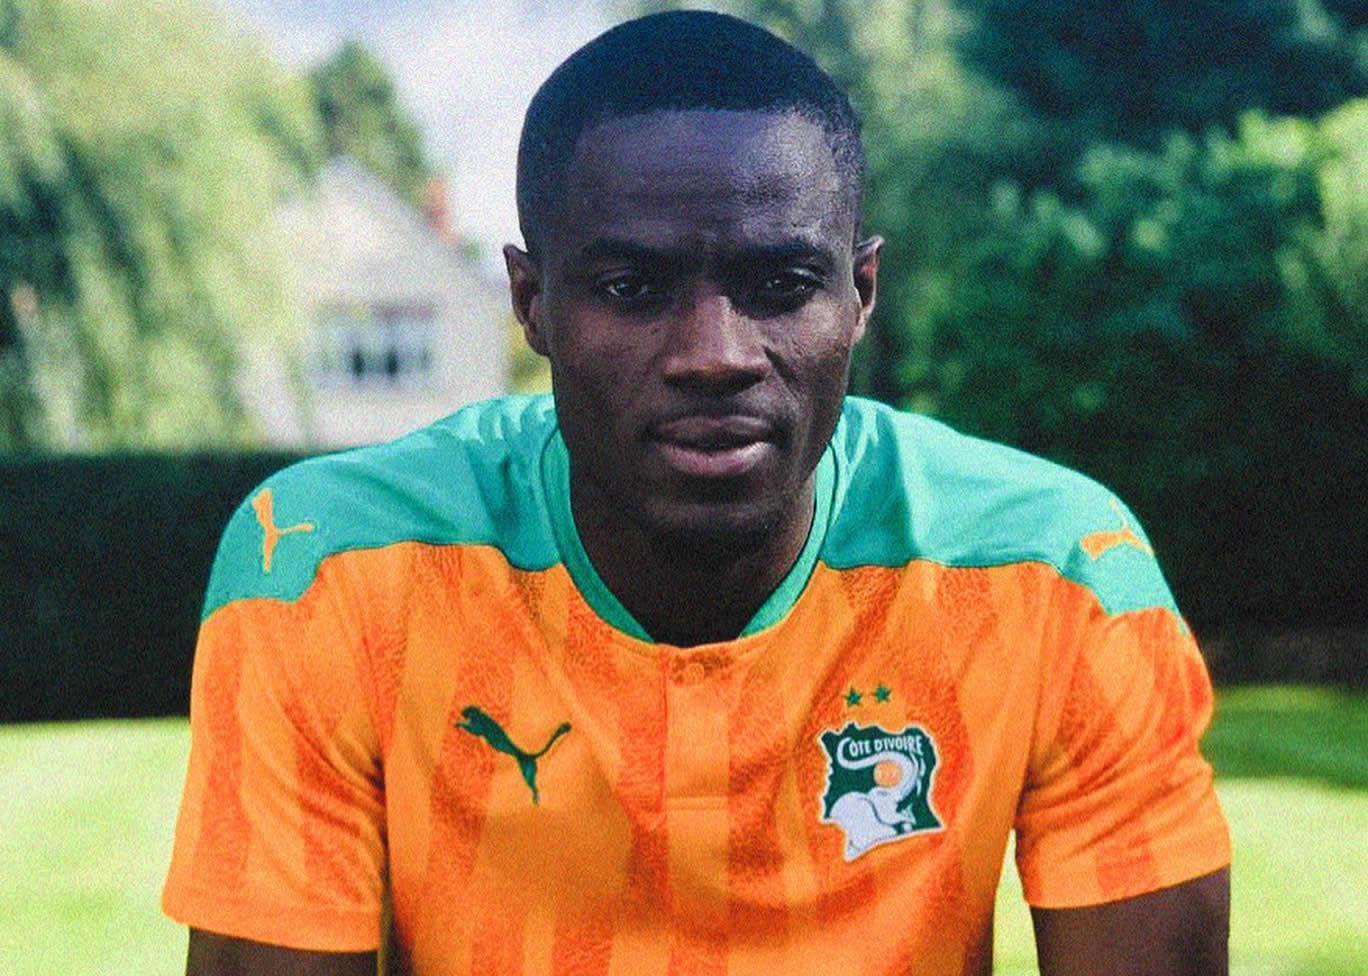 Camiseta titular de Costa de Marfil 2020/2021 | Imagen PUMA